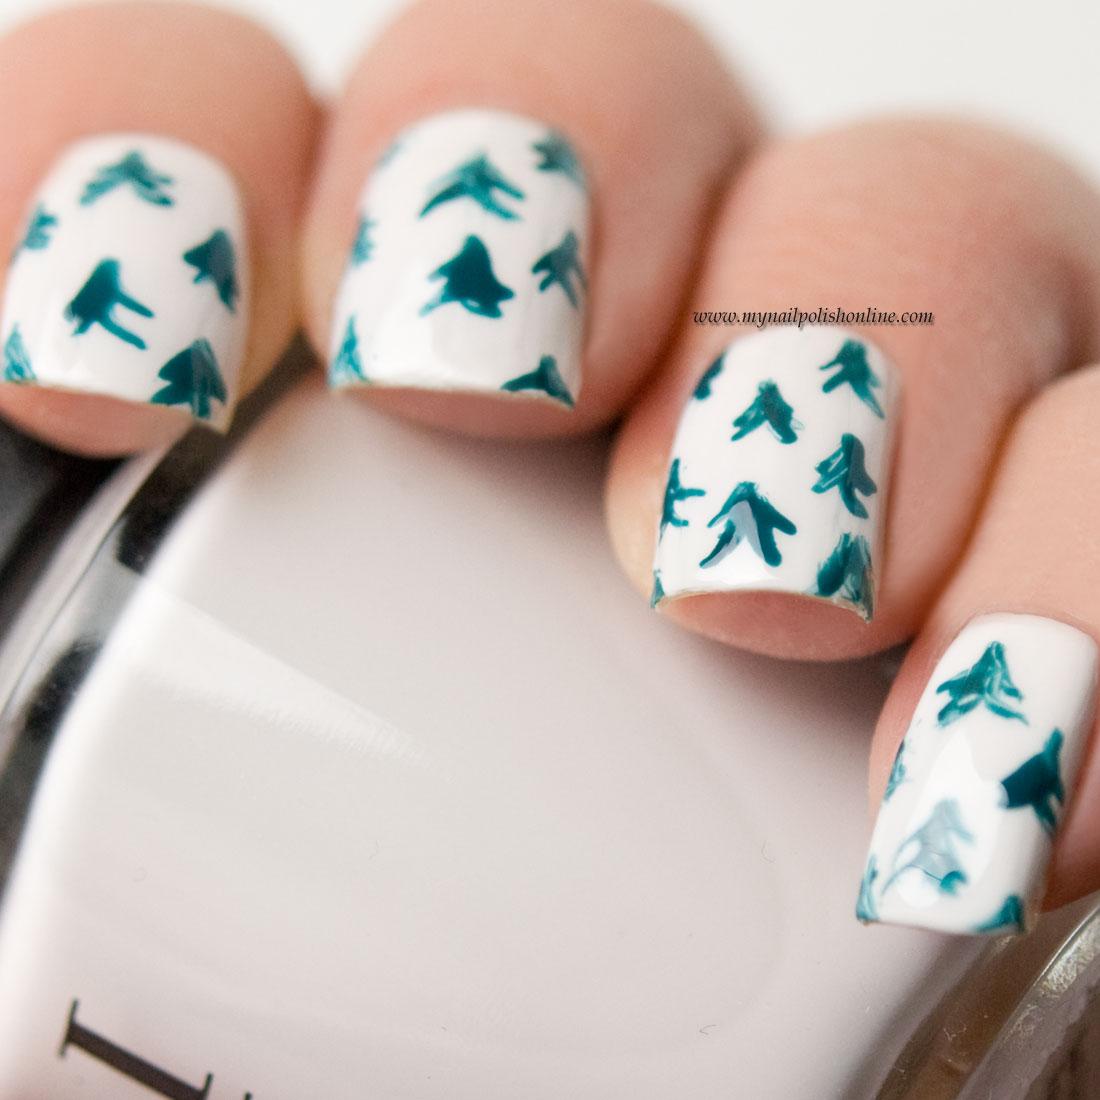 Nail Art - Winter Trees